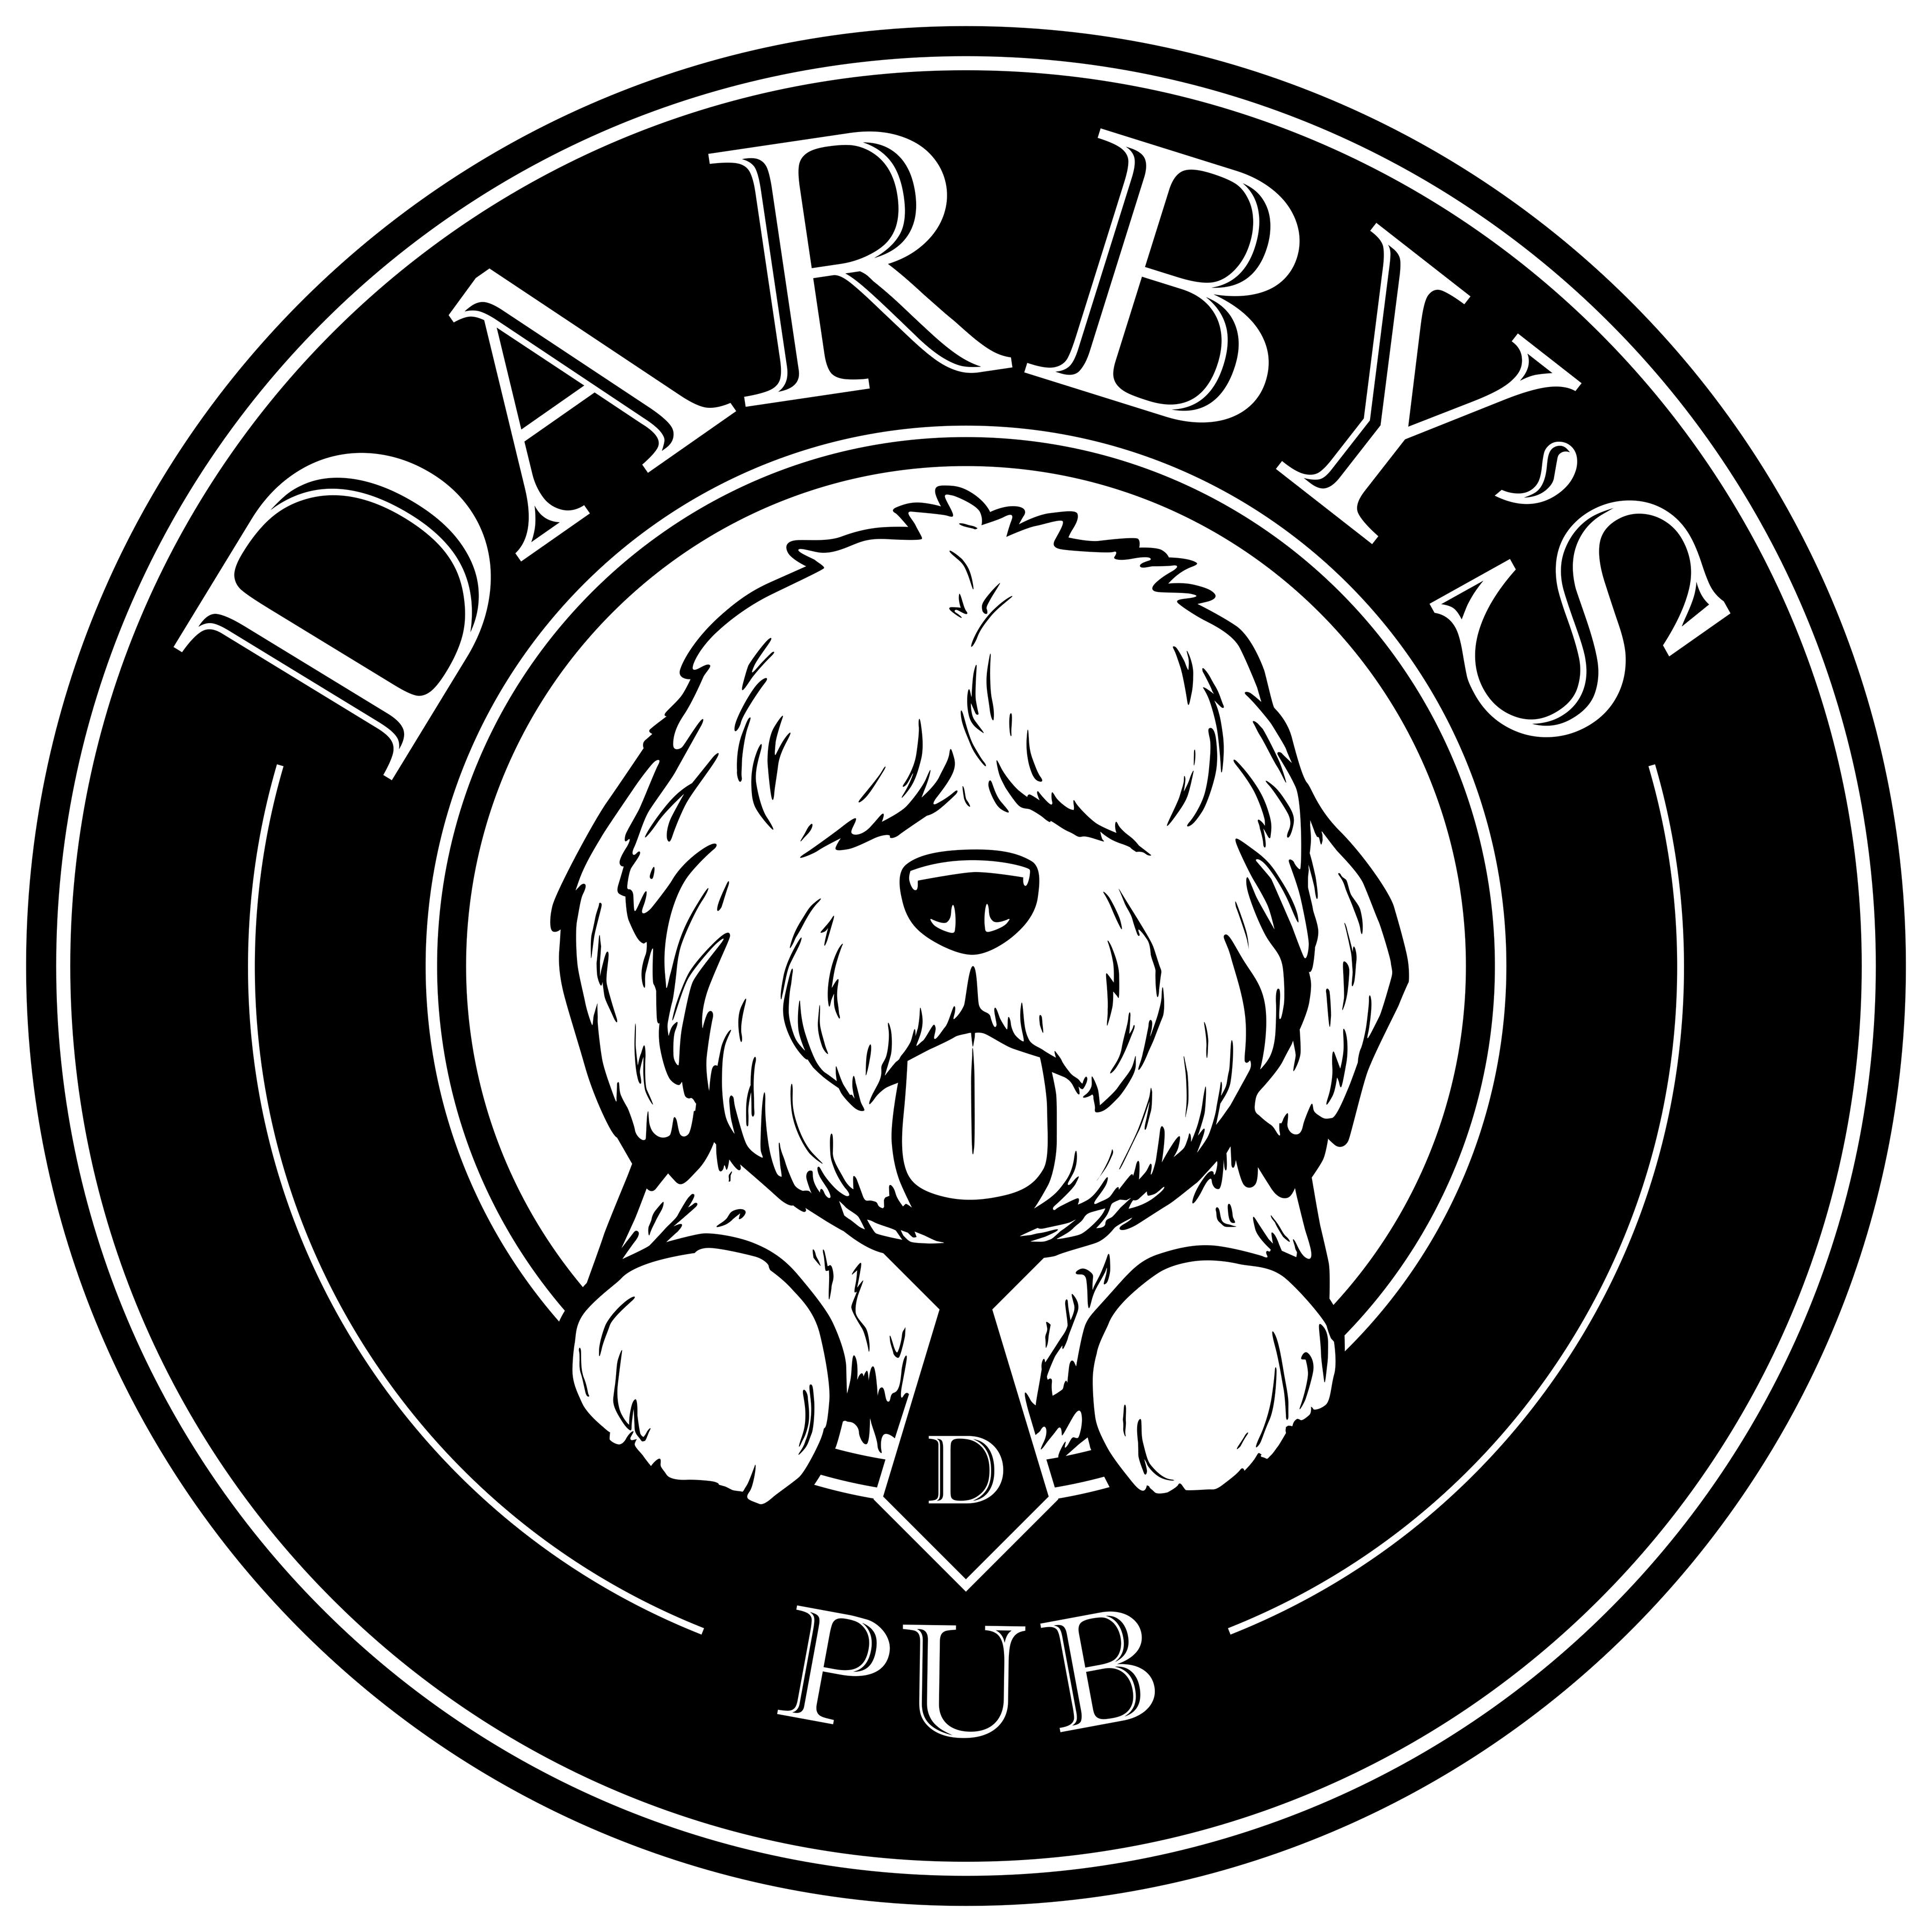 Darby's Pub